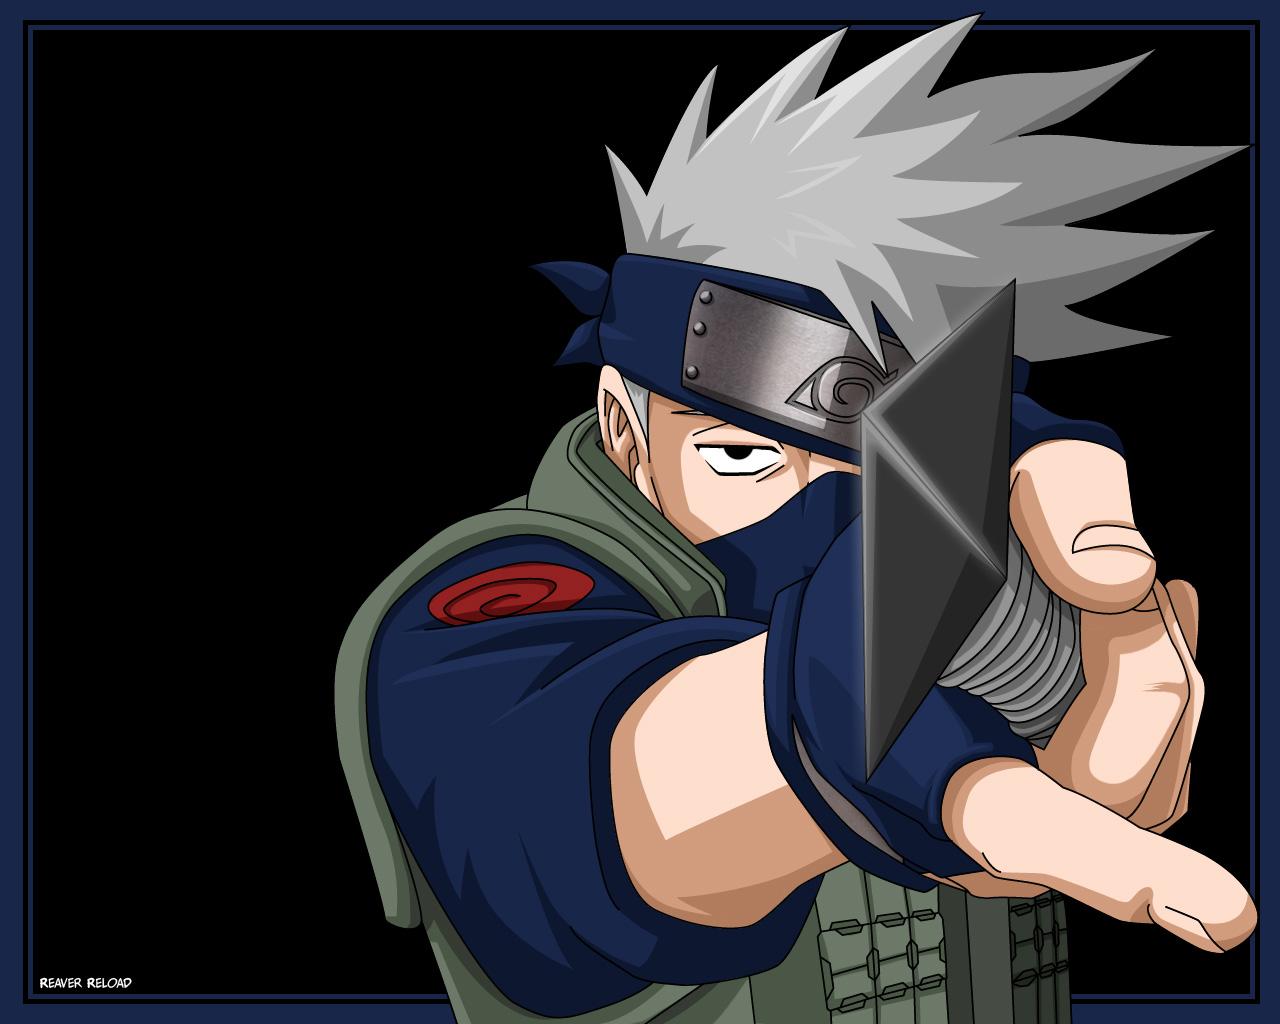 Download Anime Wallpaper Kakashi Naruto movie Anime 1280x1024